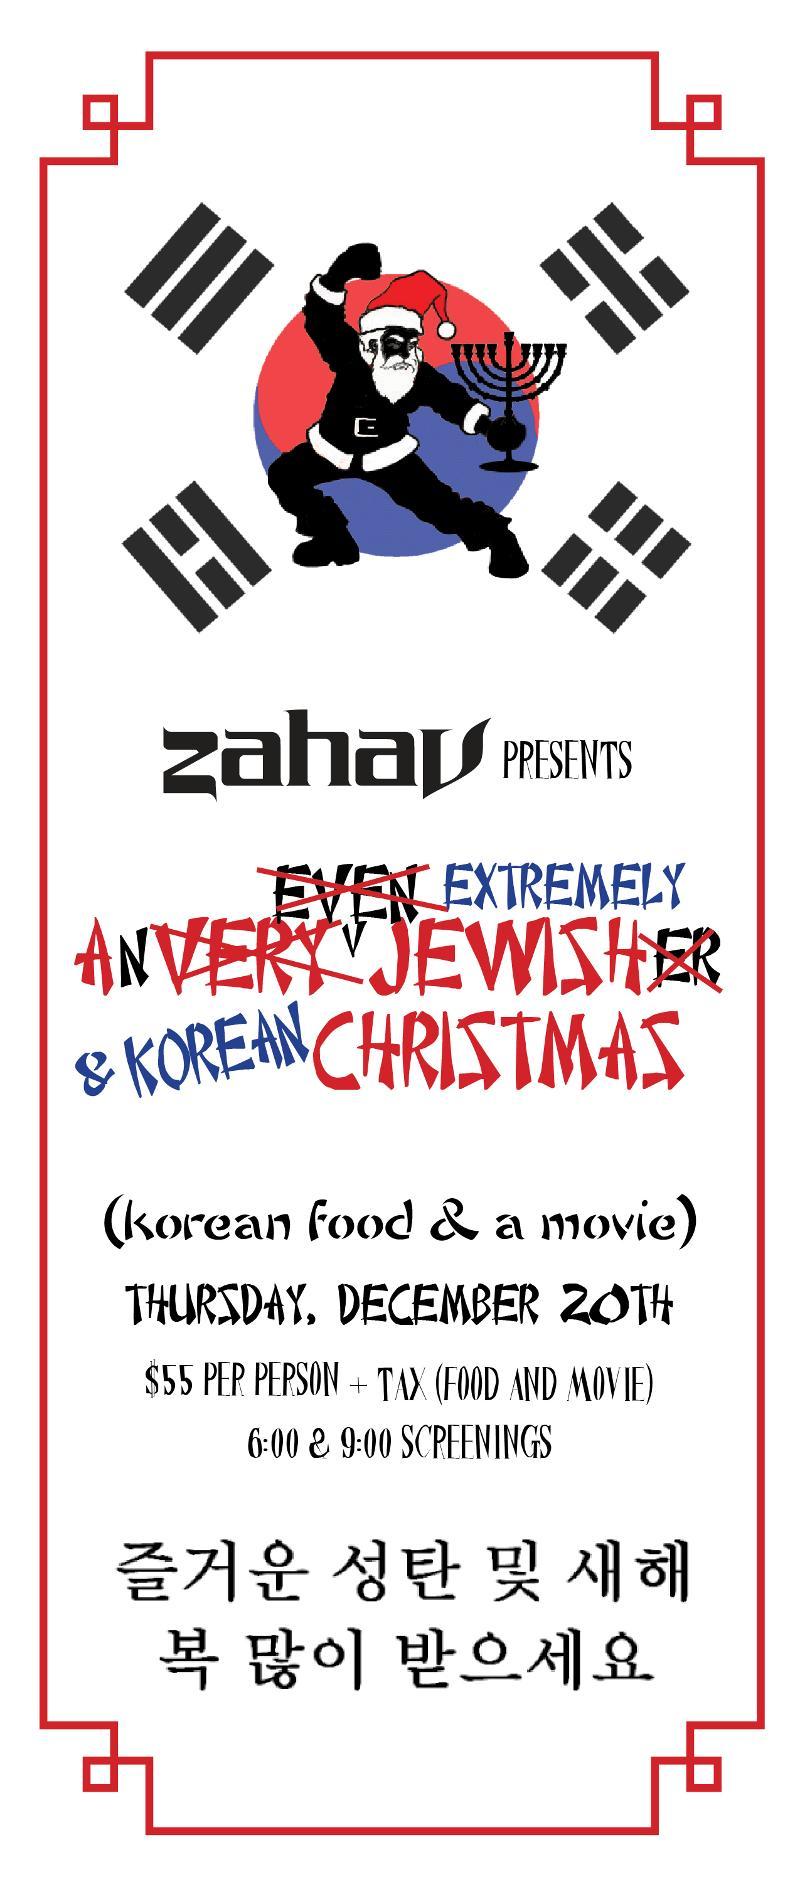 JewishChristmas_2012